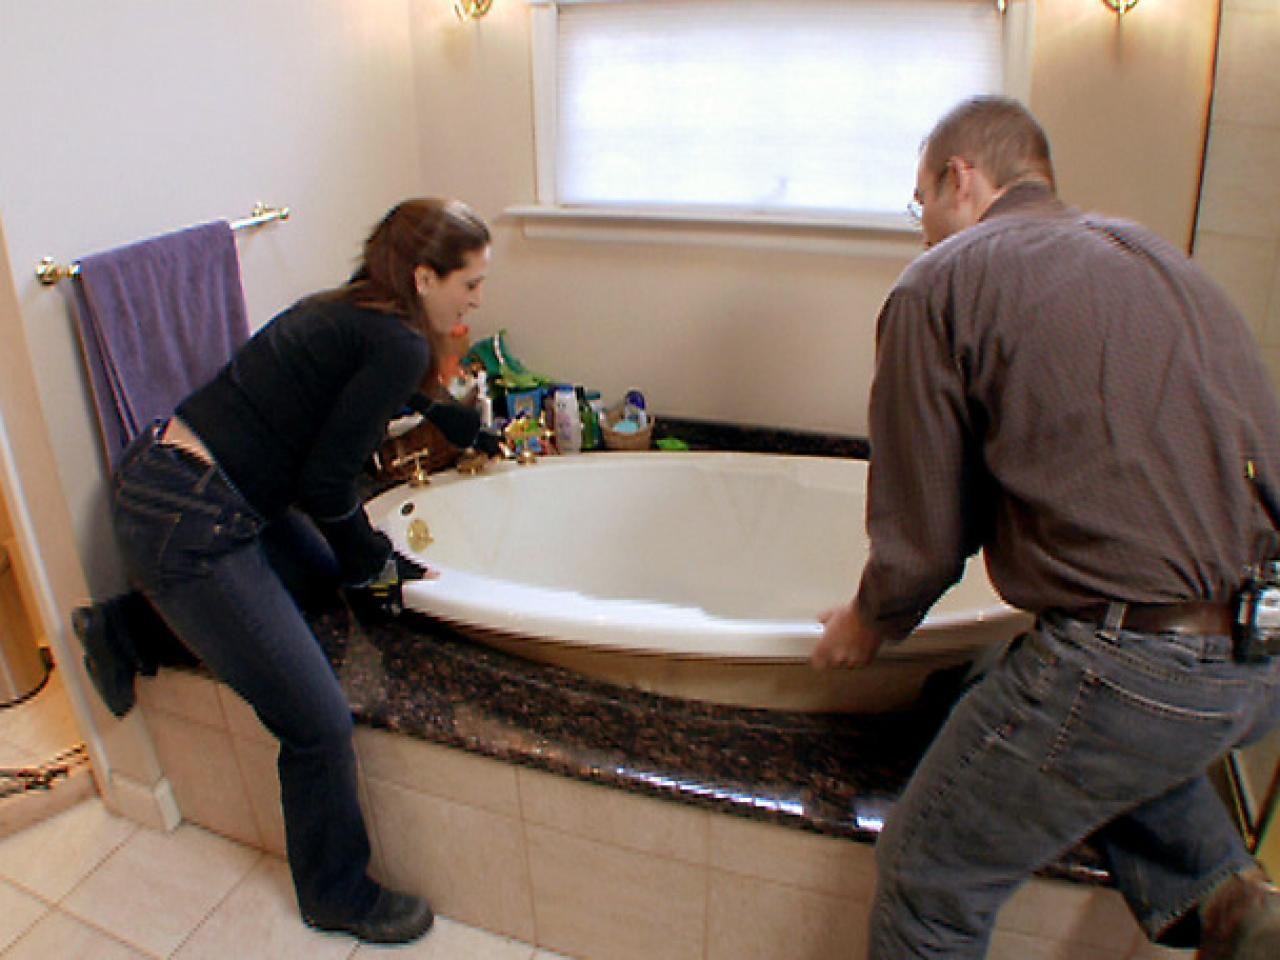 How to Install a Whirlpool Bathtub   Amy wynn pastor, Bathtubs and Tubs